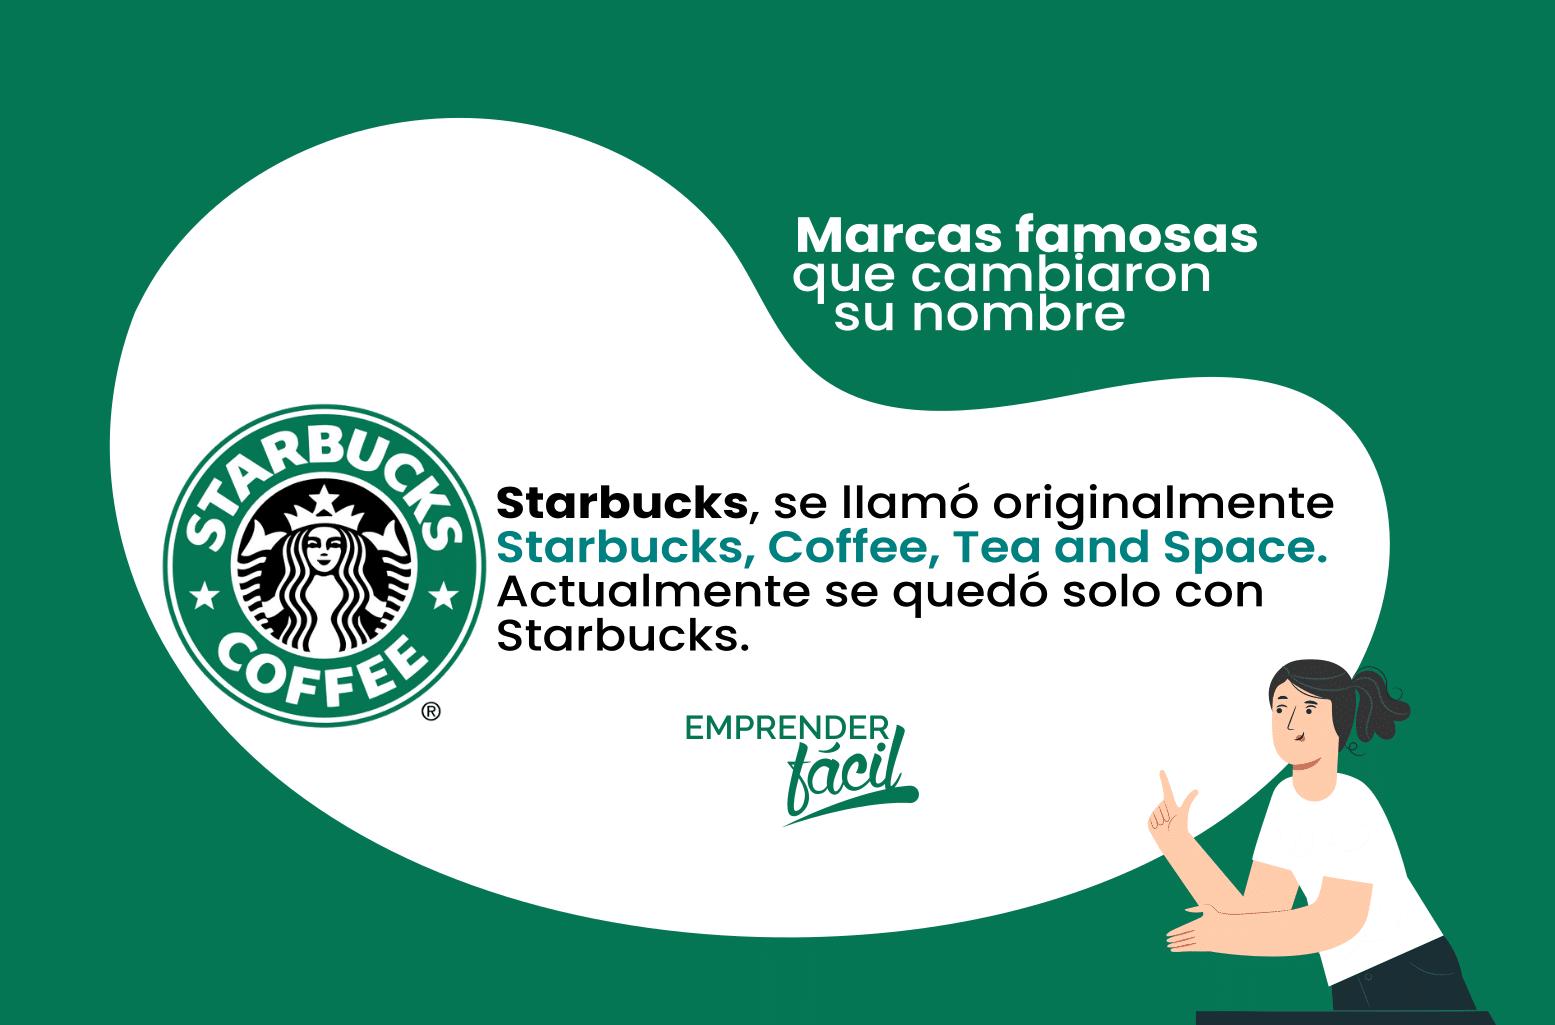 Antes de ser Starbucks, la empresa se llamó Starbucks, Coffee, Tea and Space